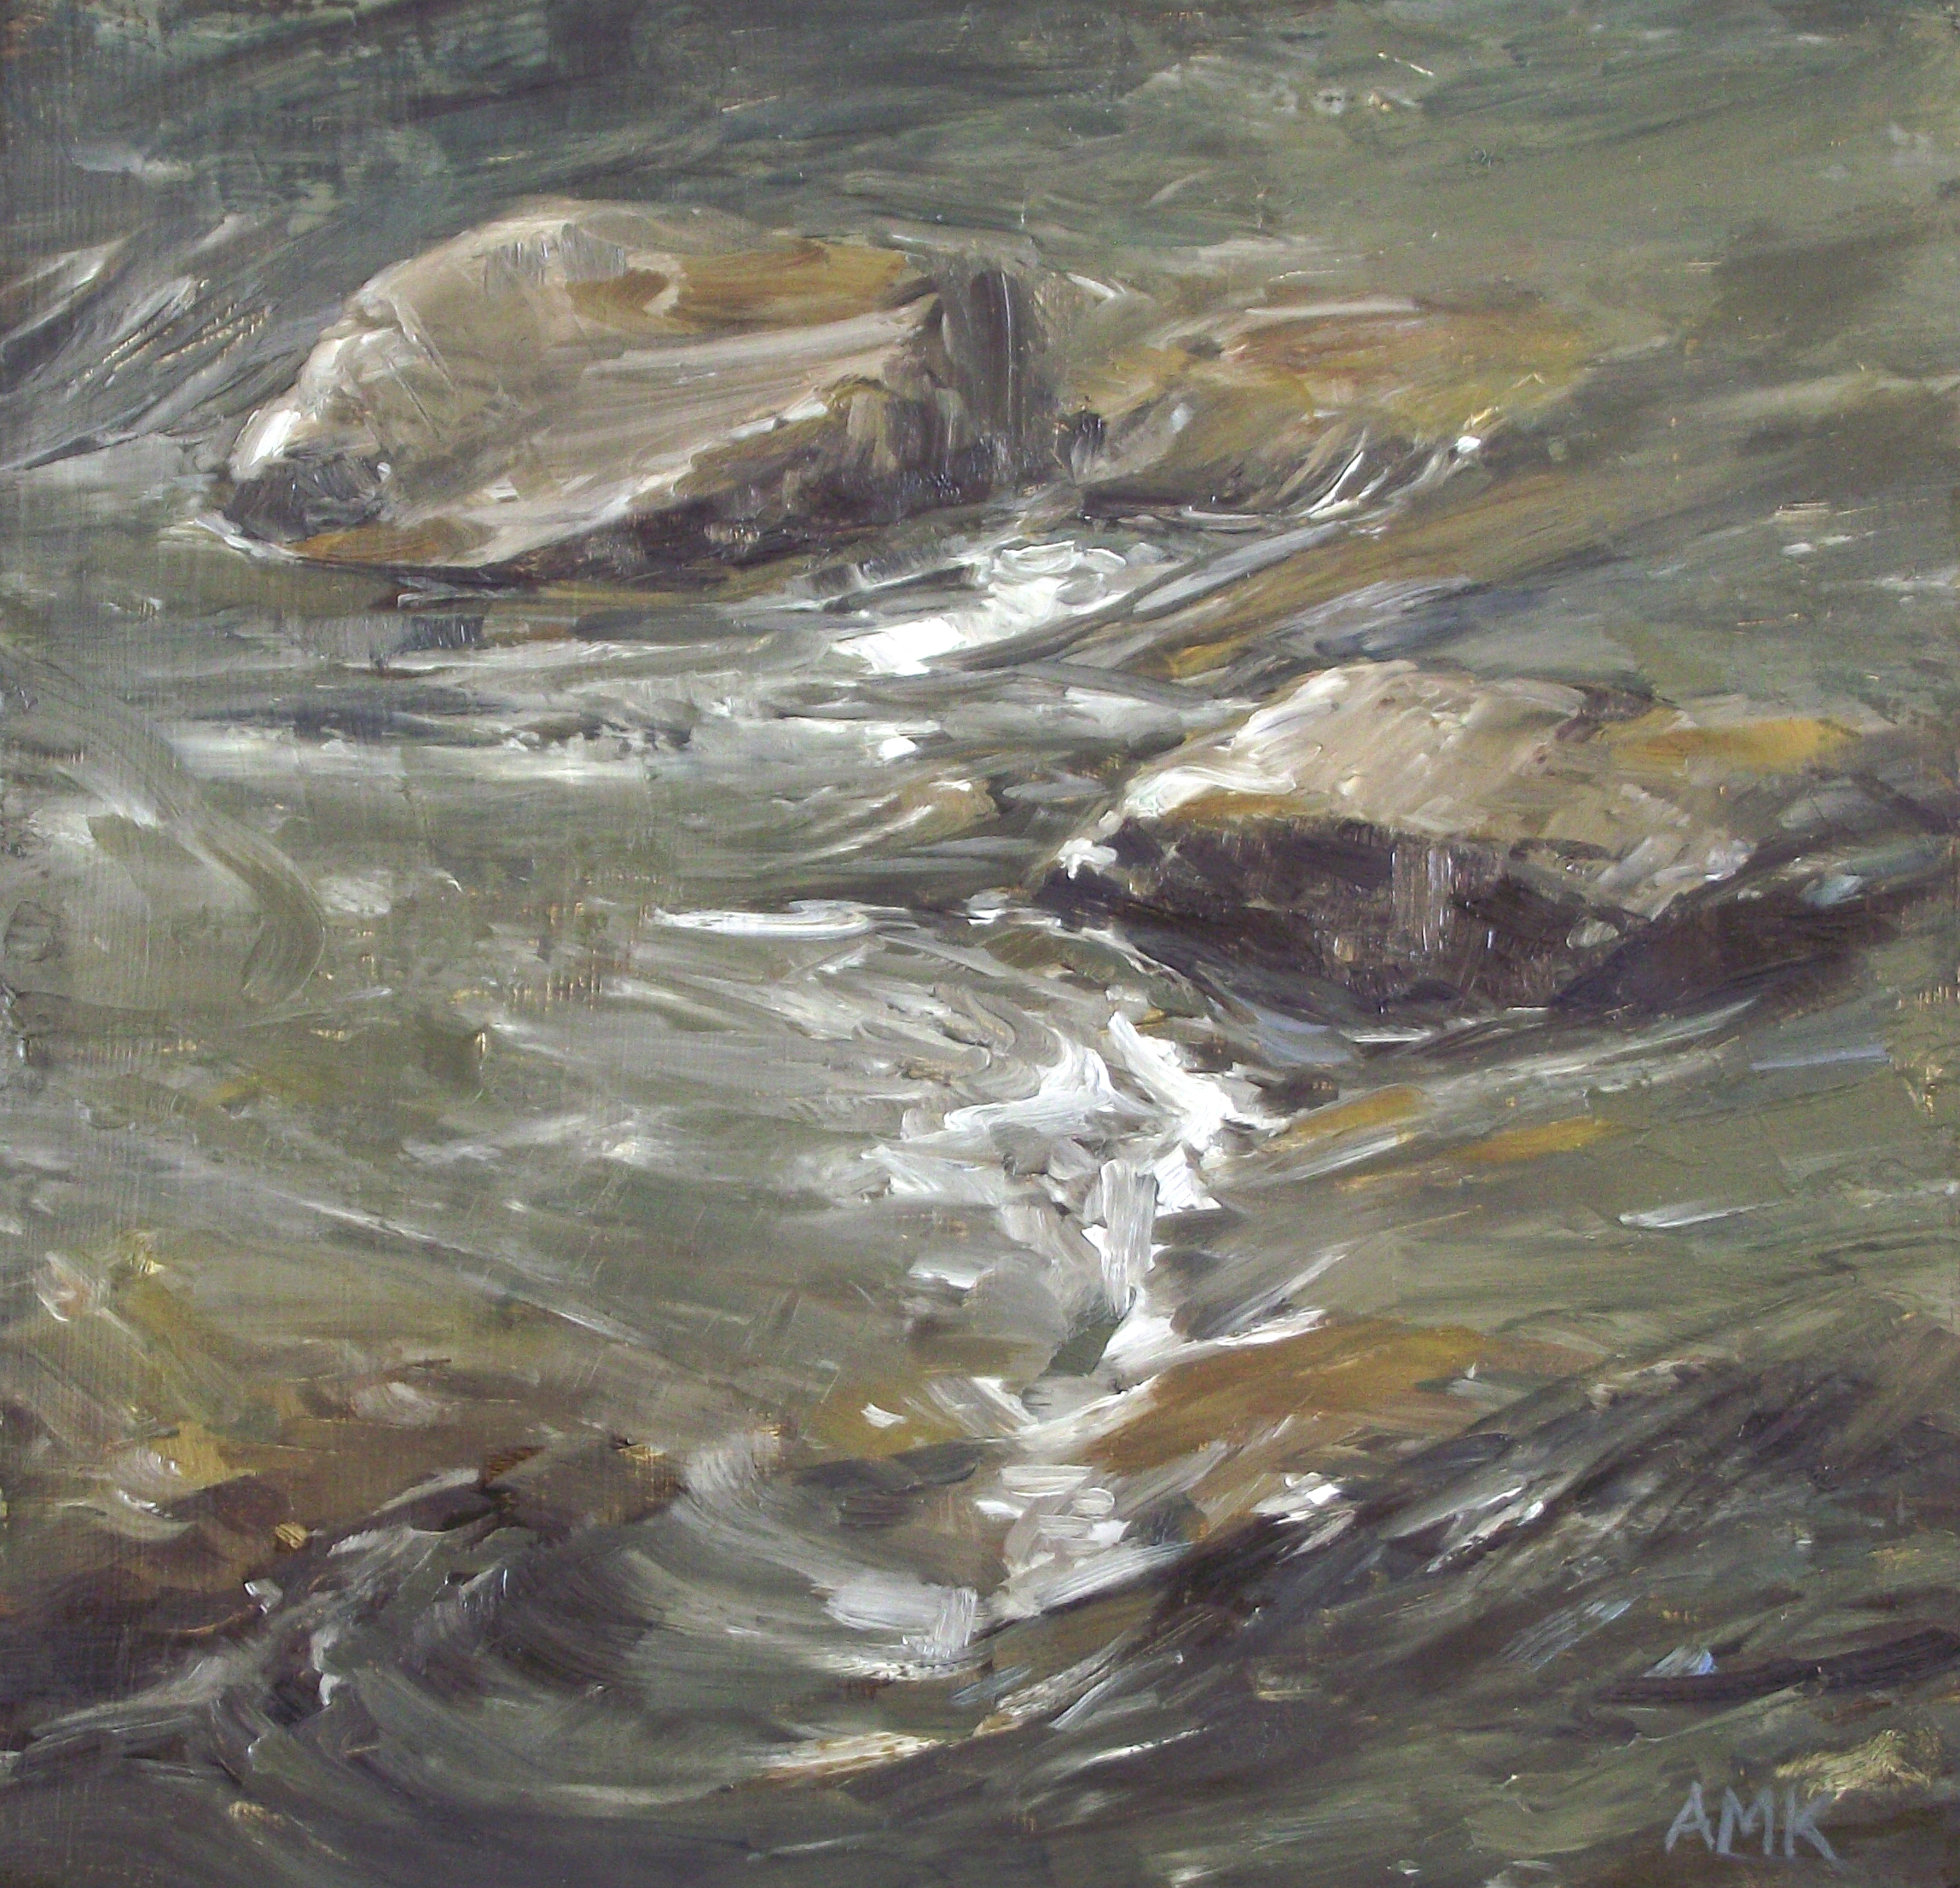 "Seam   oil on panel  7 x 6.75""  2013"